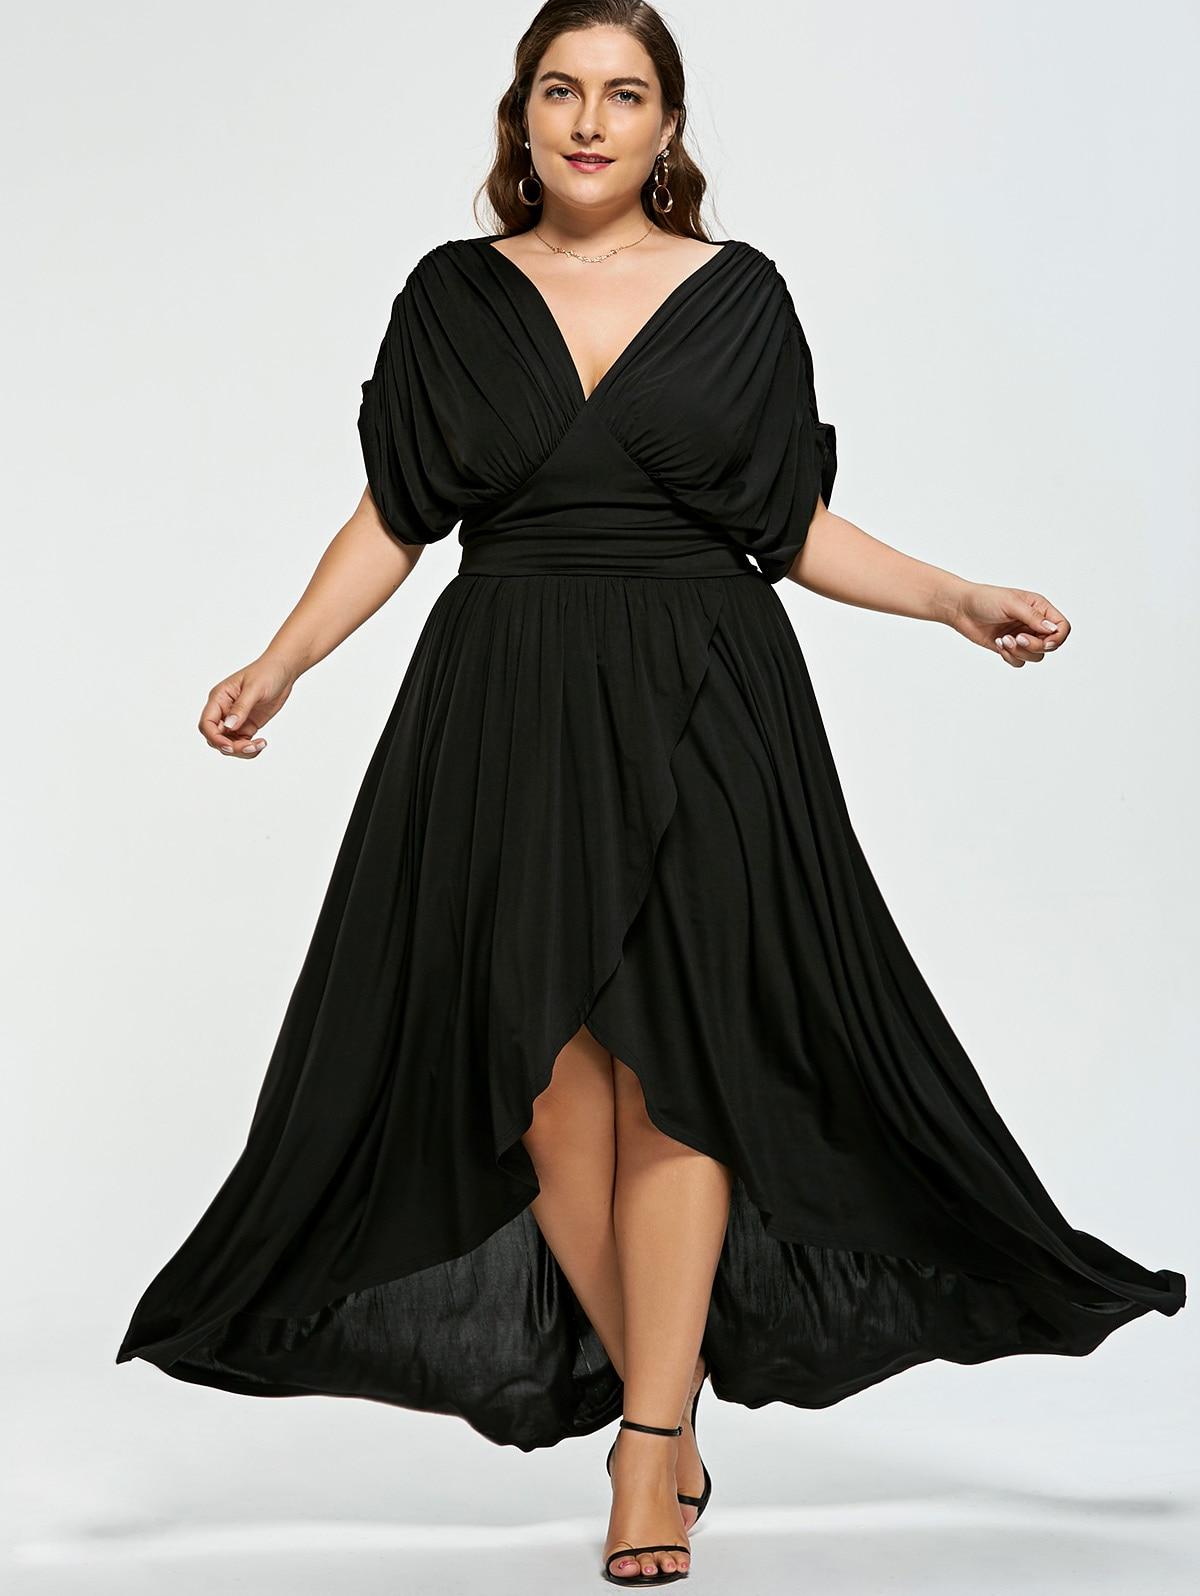 Wipalo Plus Size V Neck Women Summer Dress Short Sleeve ...